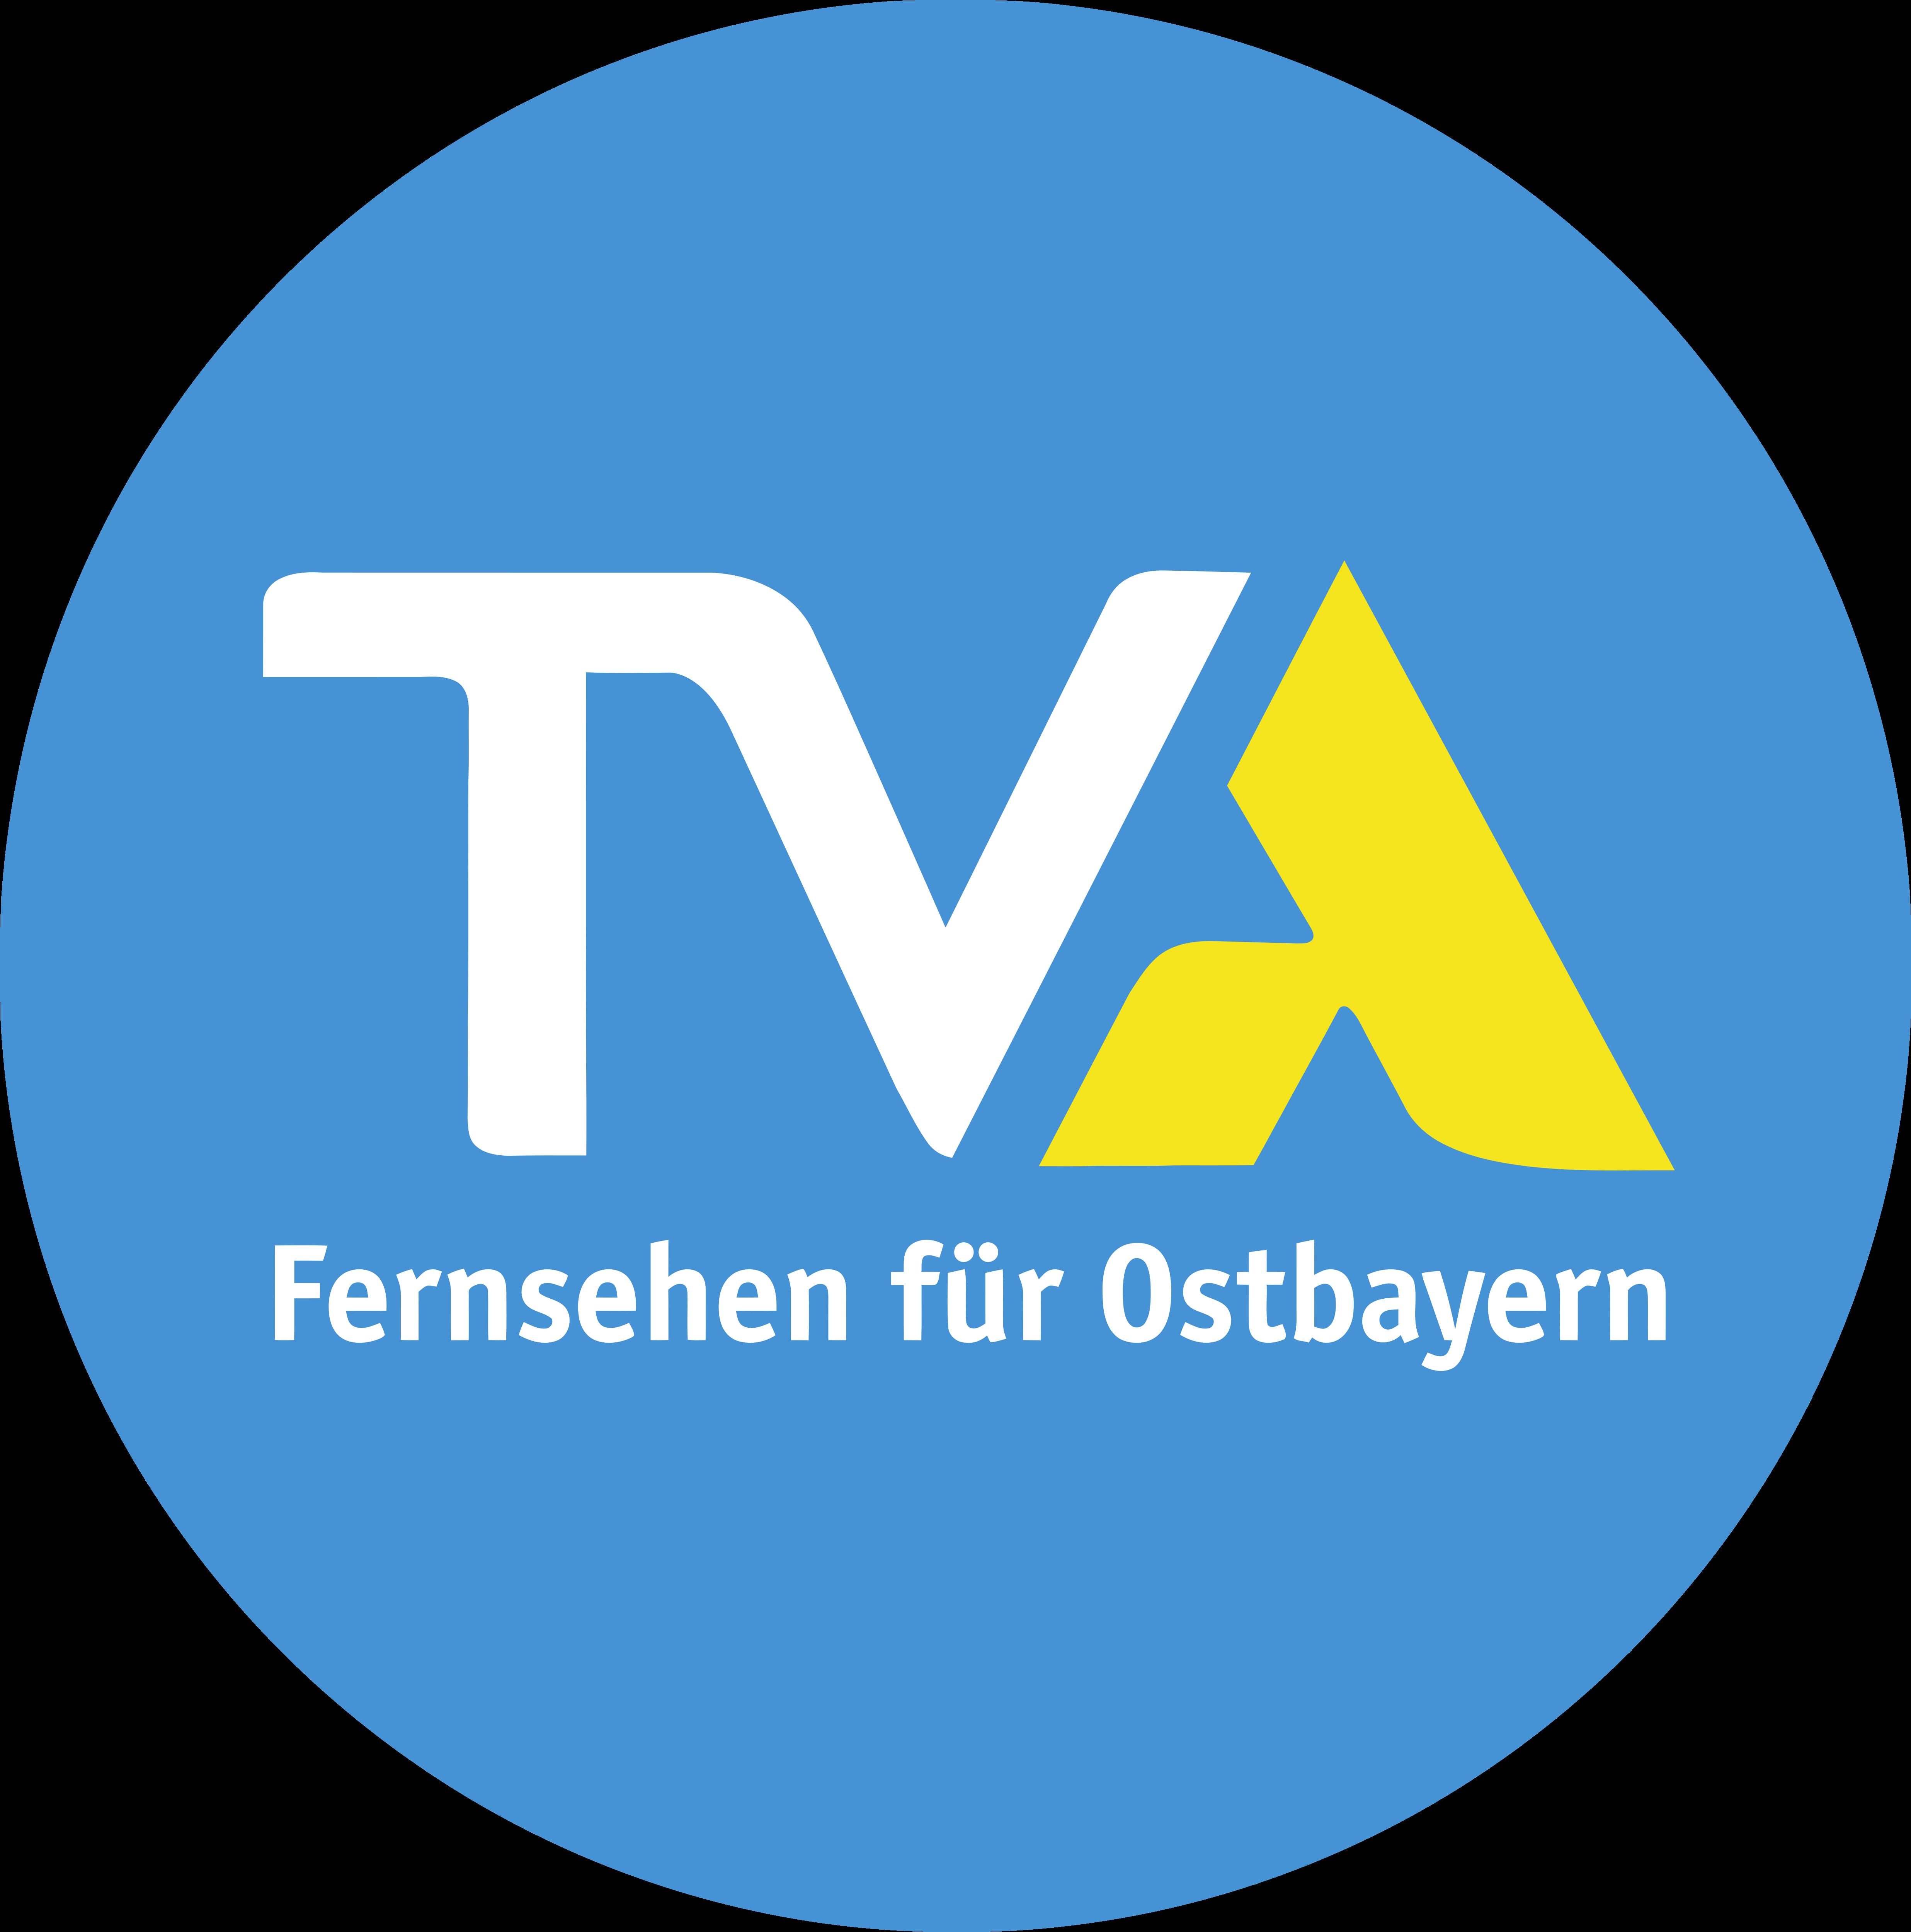 Tva Fernsehen